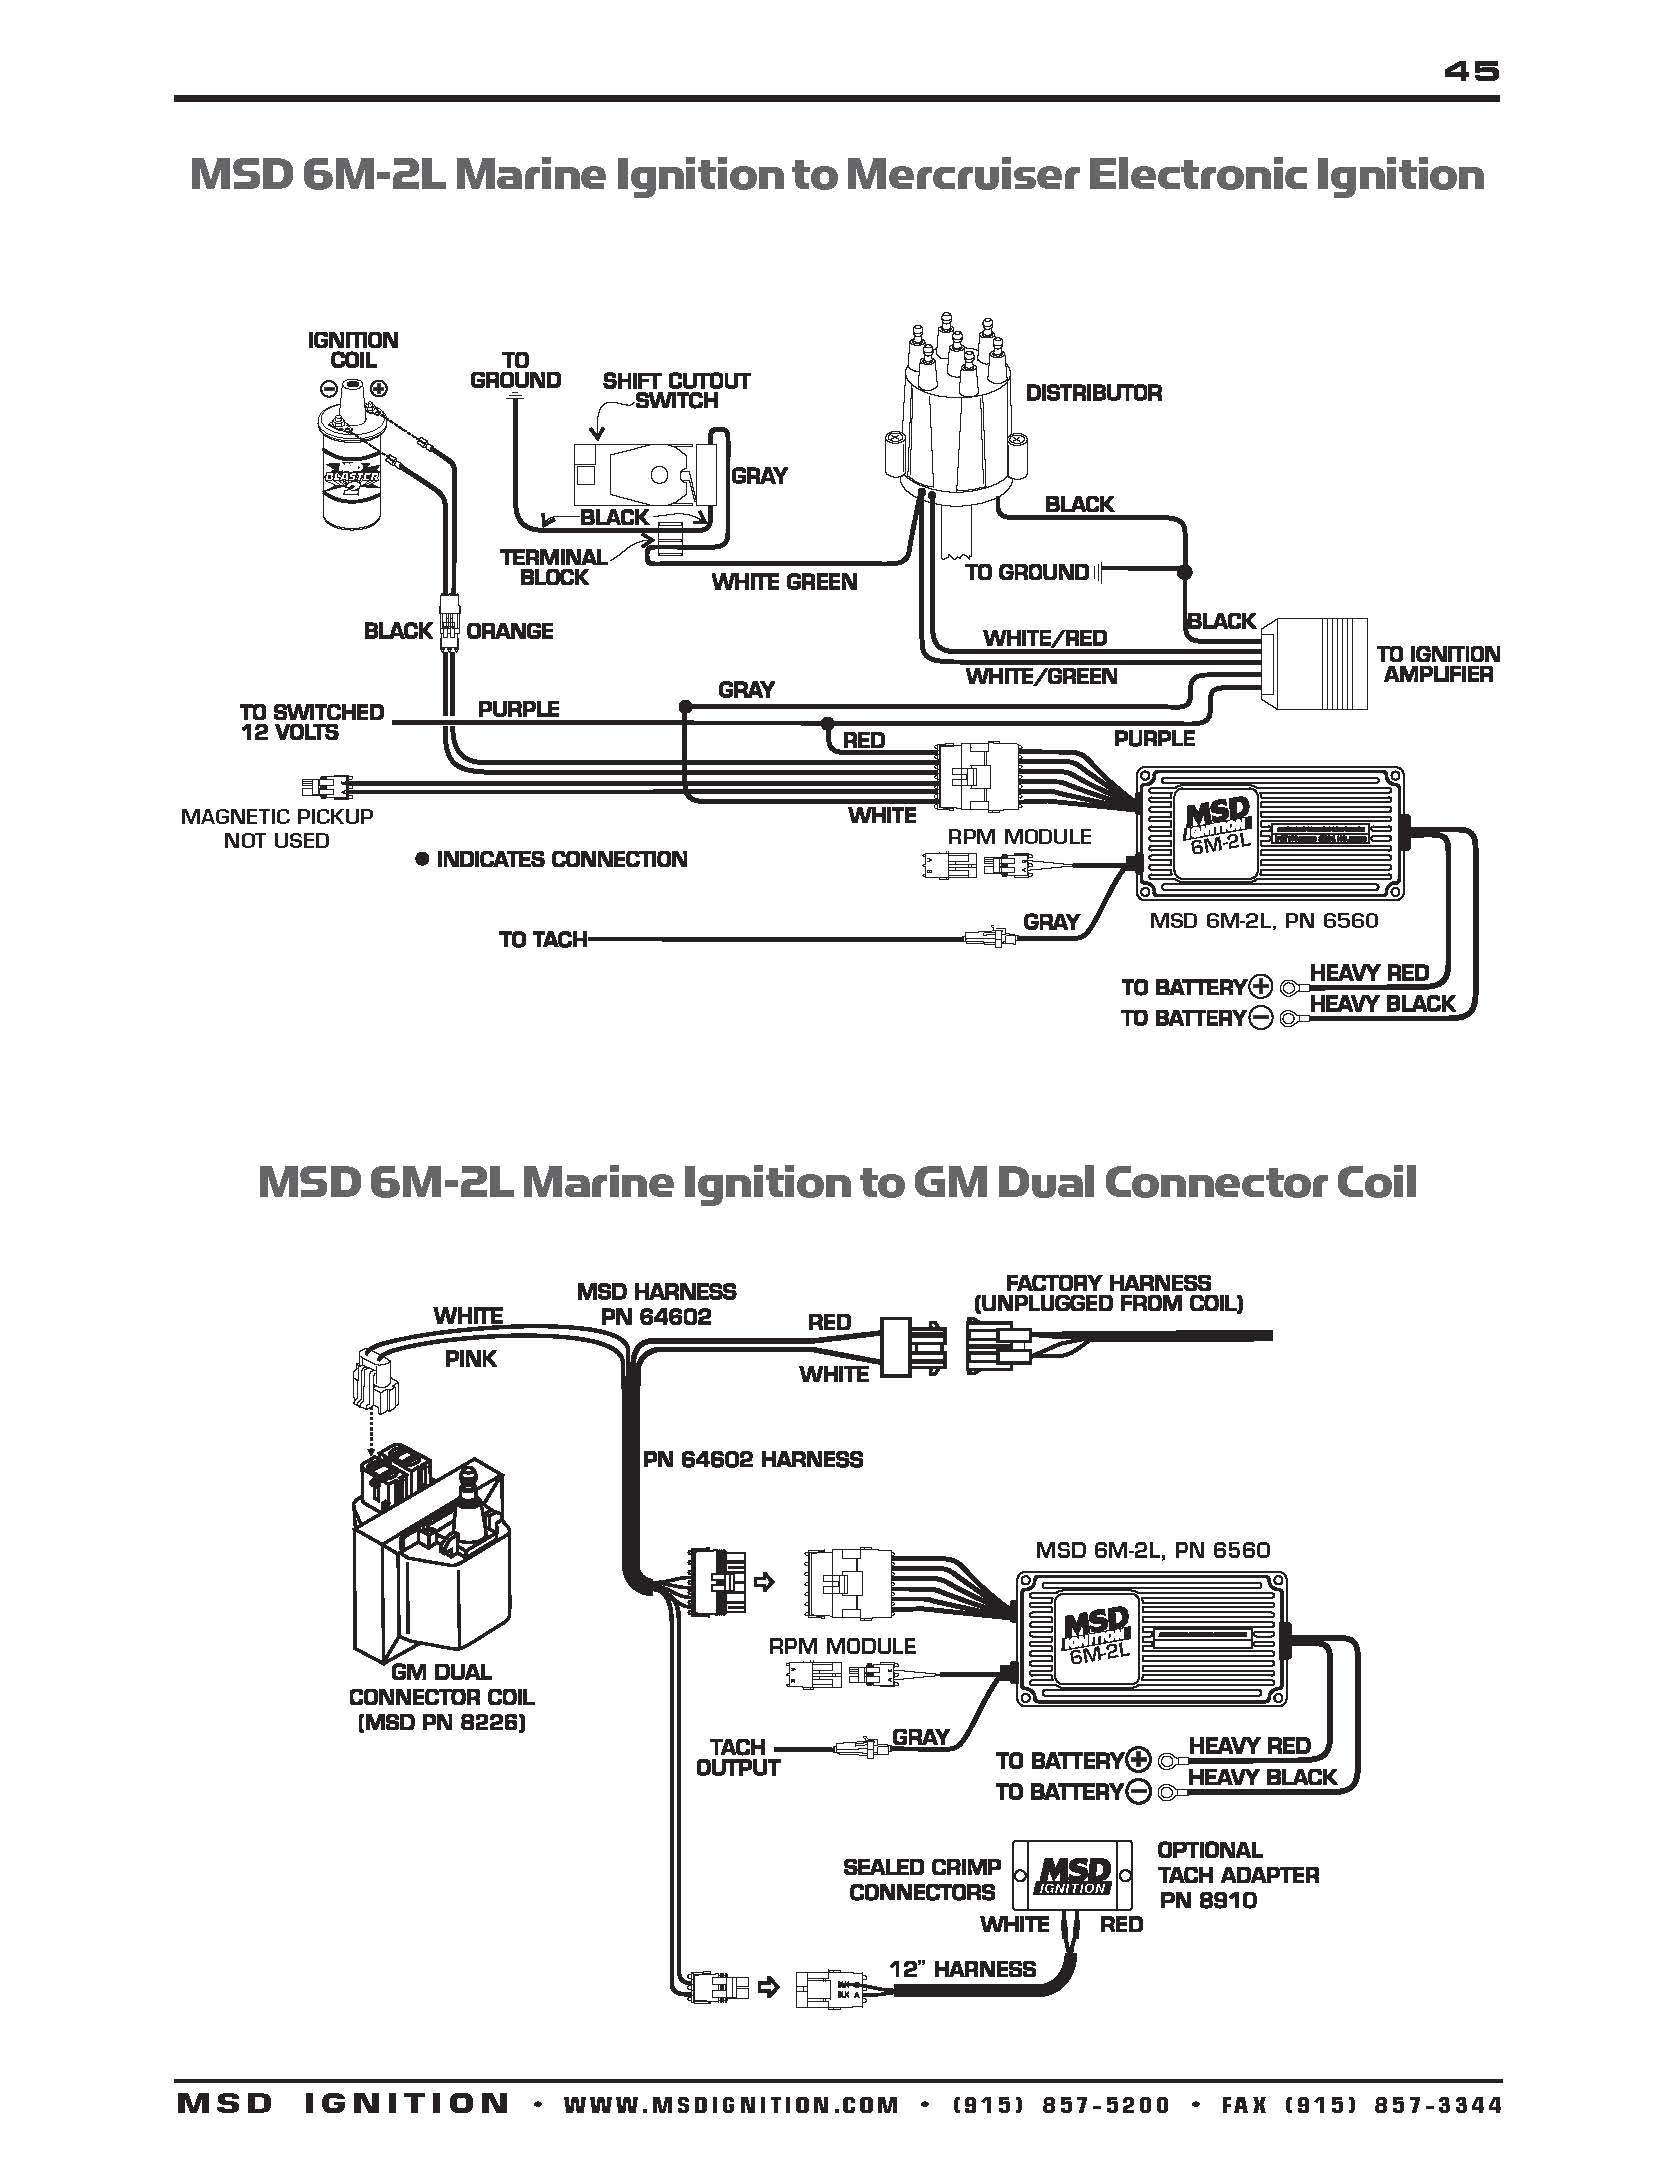 msd 5200 wiring diagram ignition wiring diagram image msd ignition wiring diagram dodge